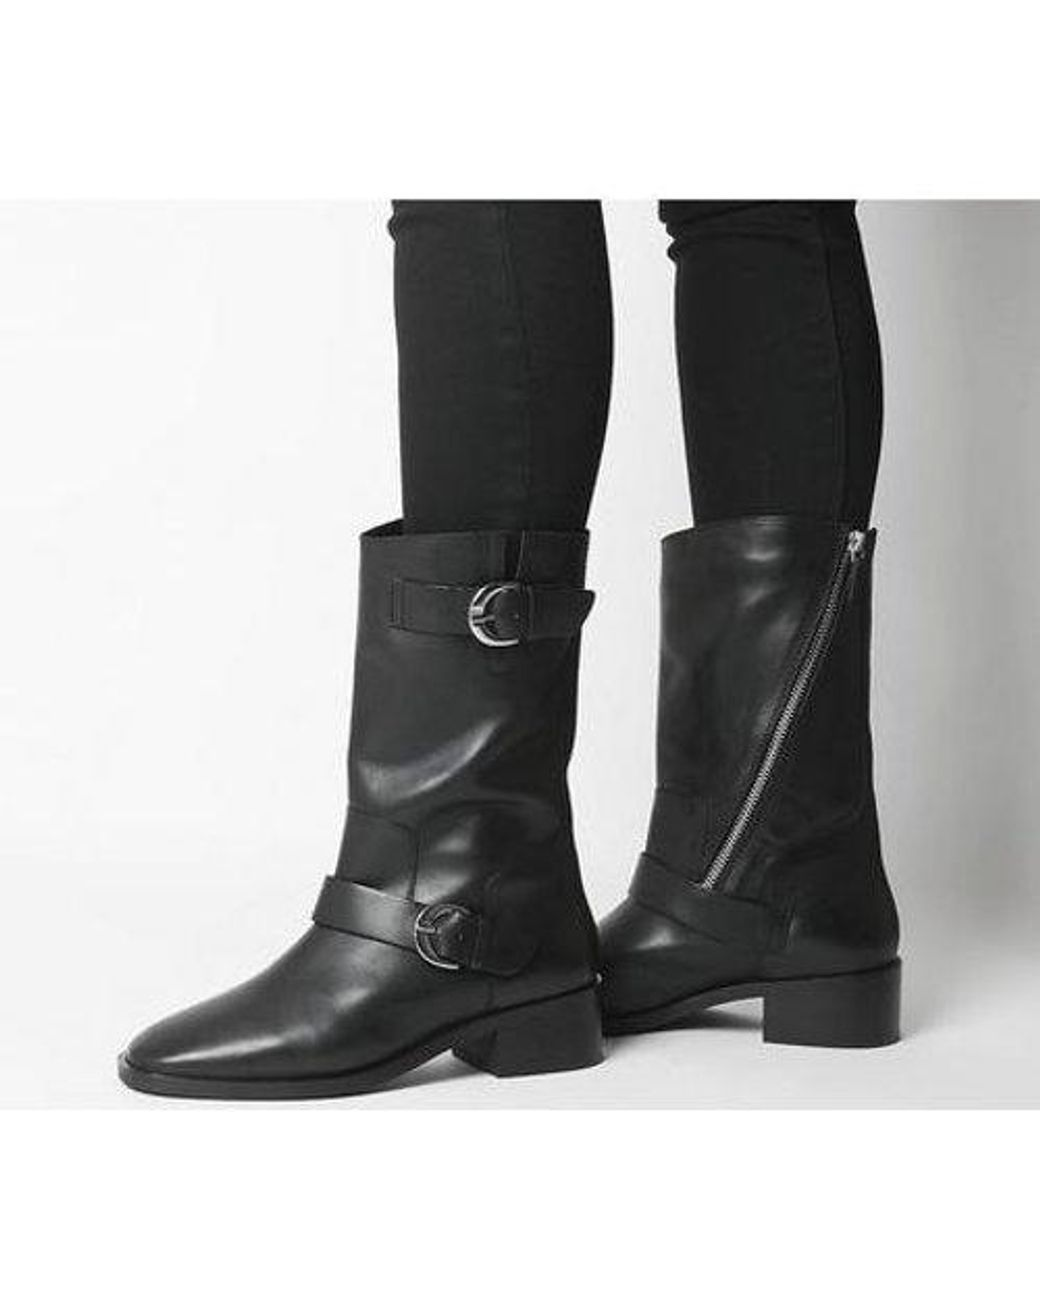 Office Kick- Calf Biker Boot in Black